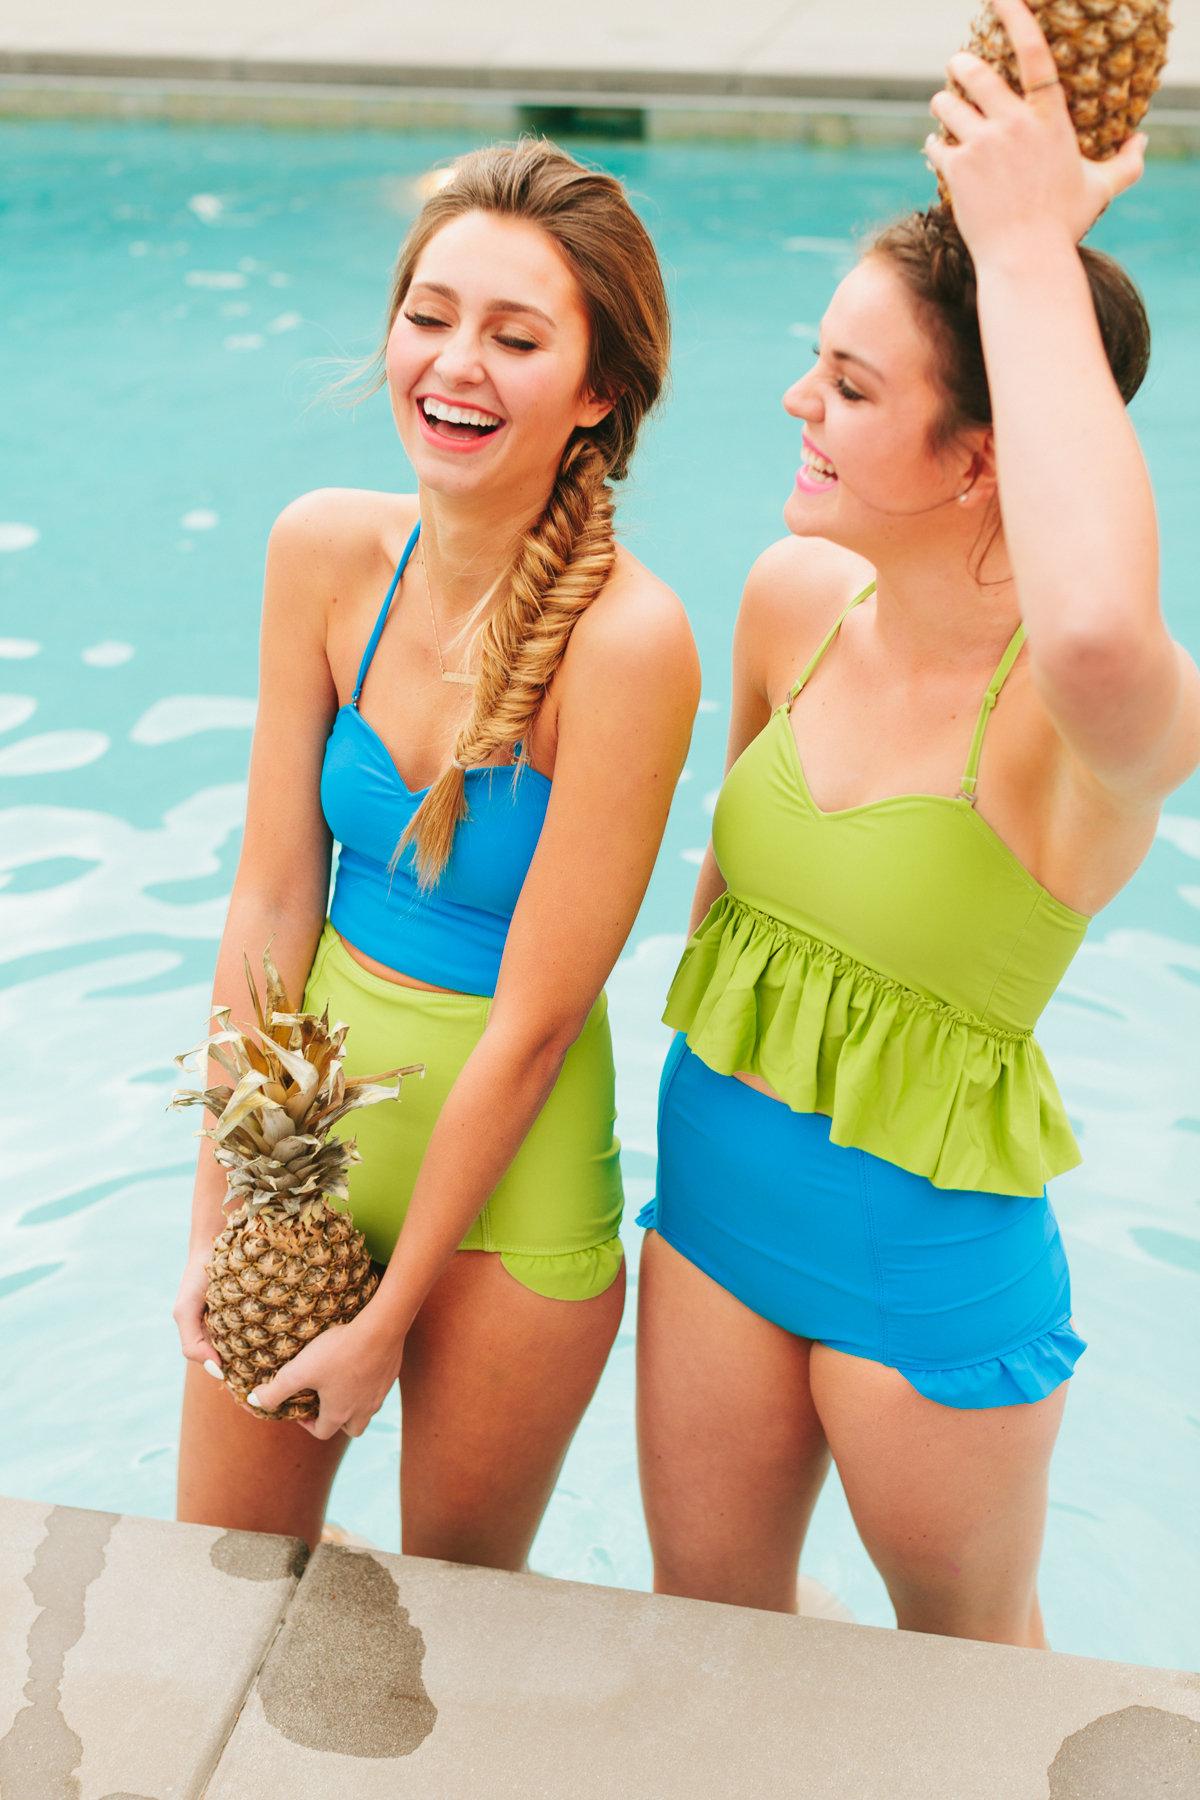 Mormon girls bikinis